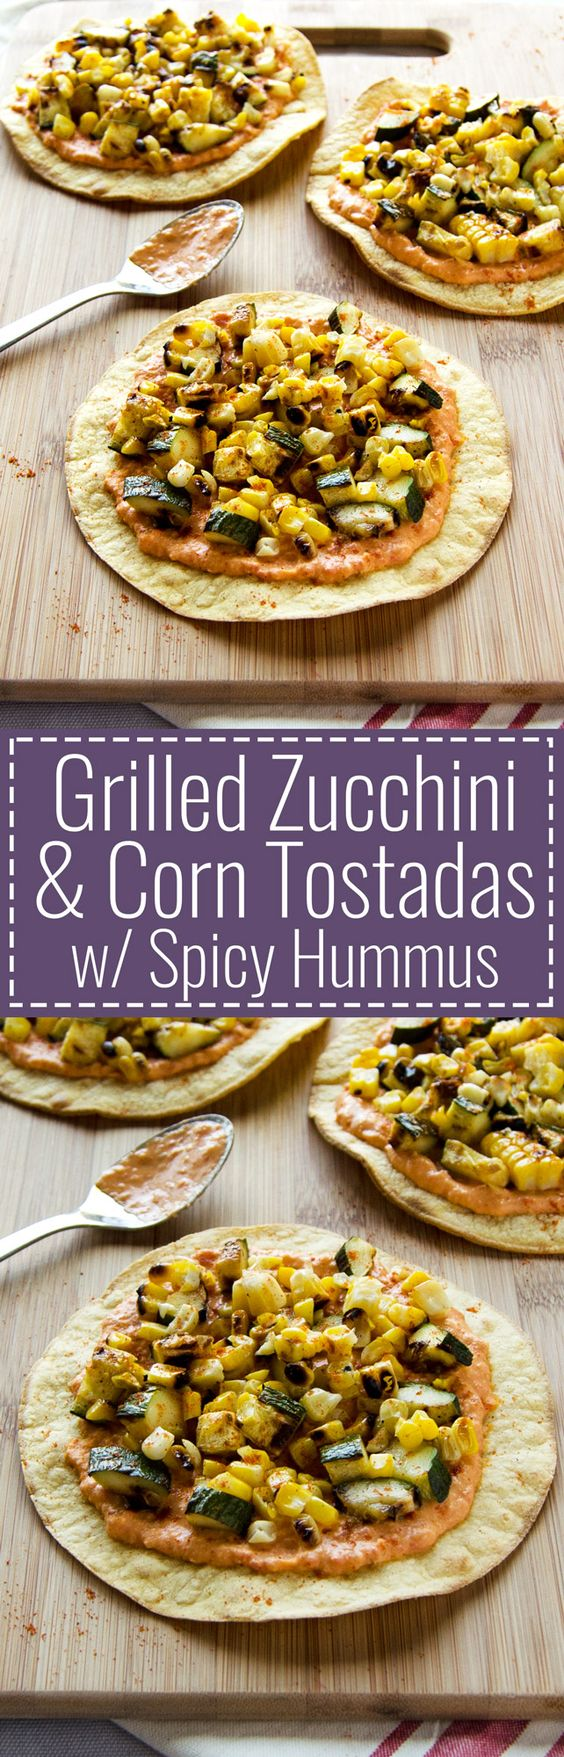 03 - Noming Through Life - Zucchini and Corn Tostadas